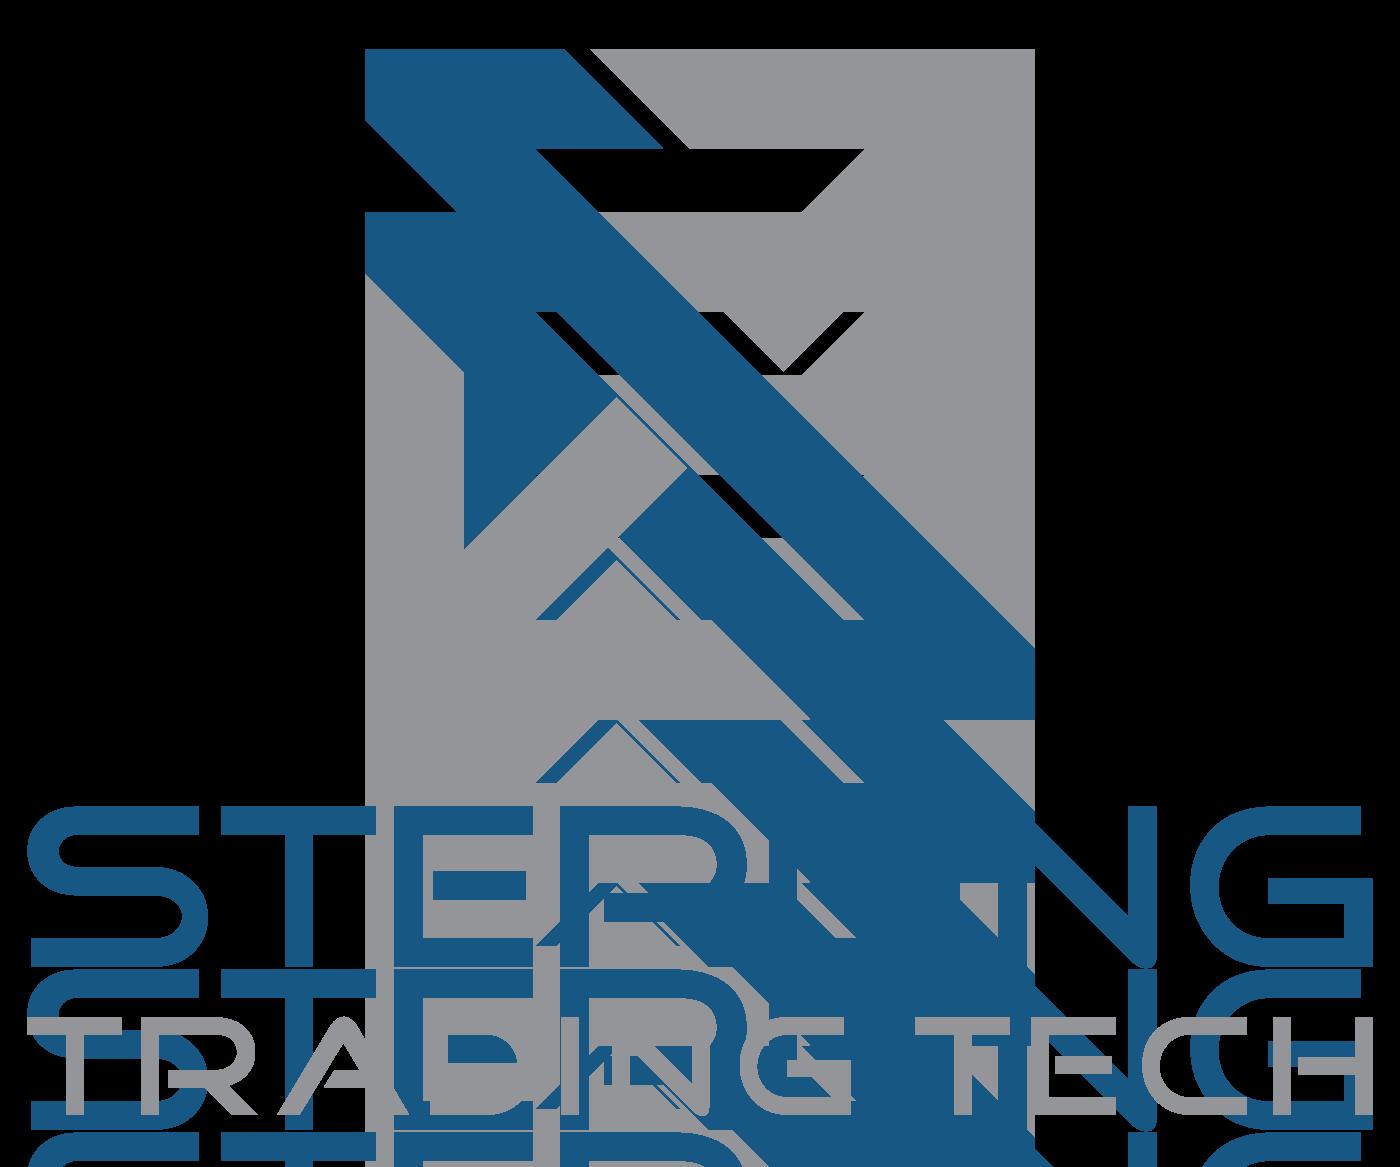 Sterling Trading Tech